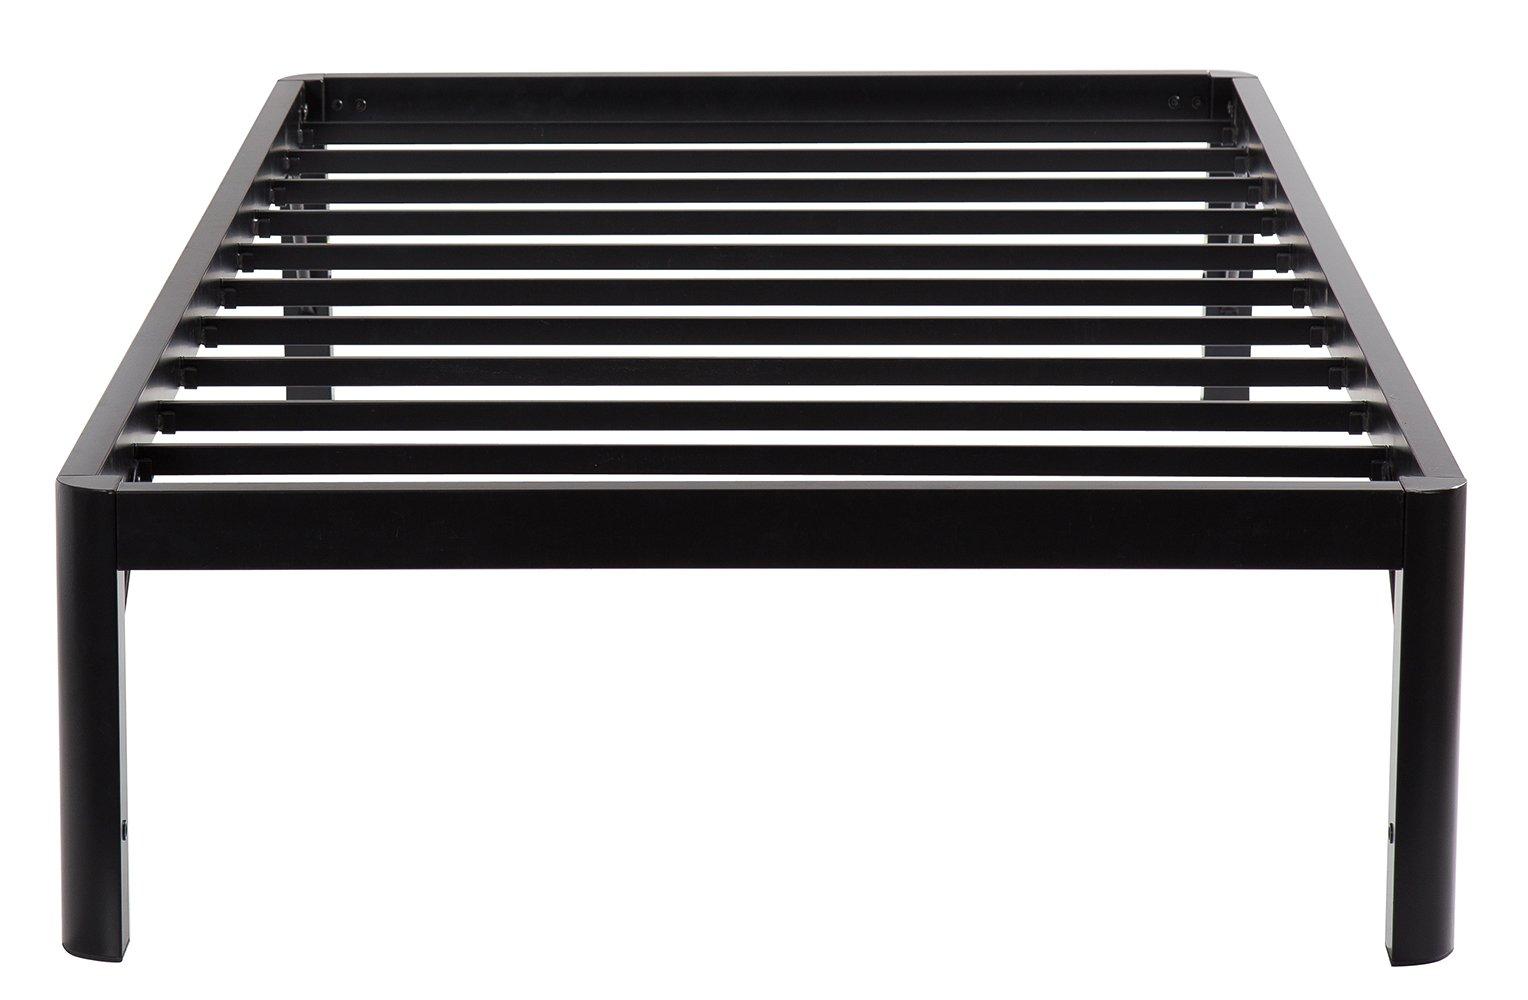 Olee Sleep 14Inch Dura Metal Steel Slate Bed Frame - S3500 Twin 14BF10T